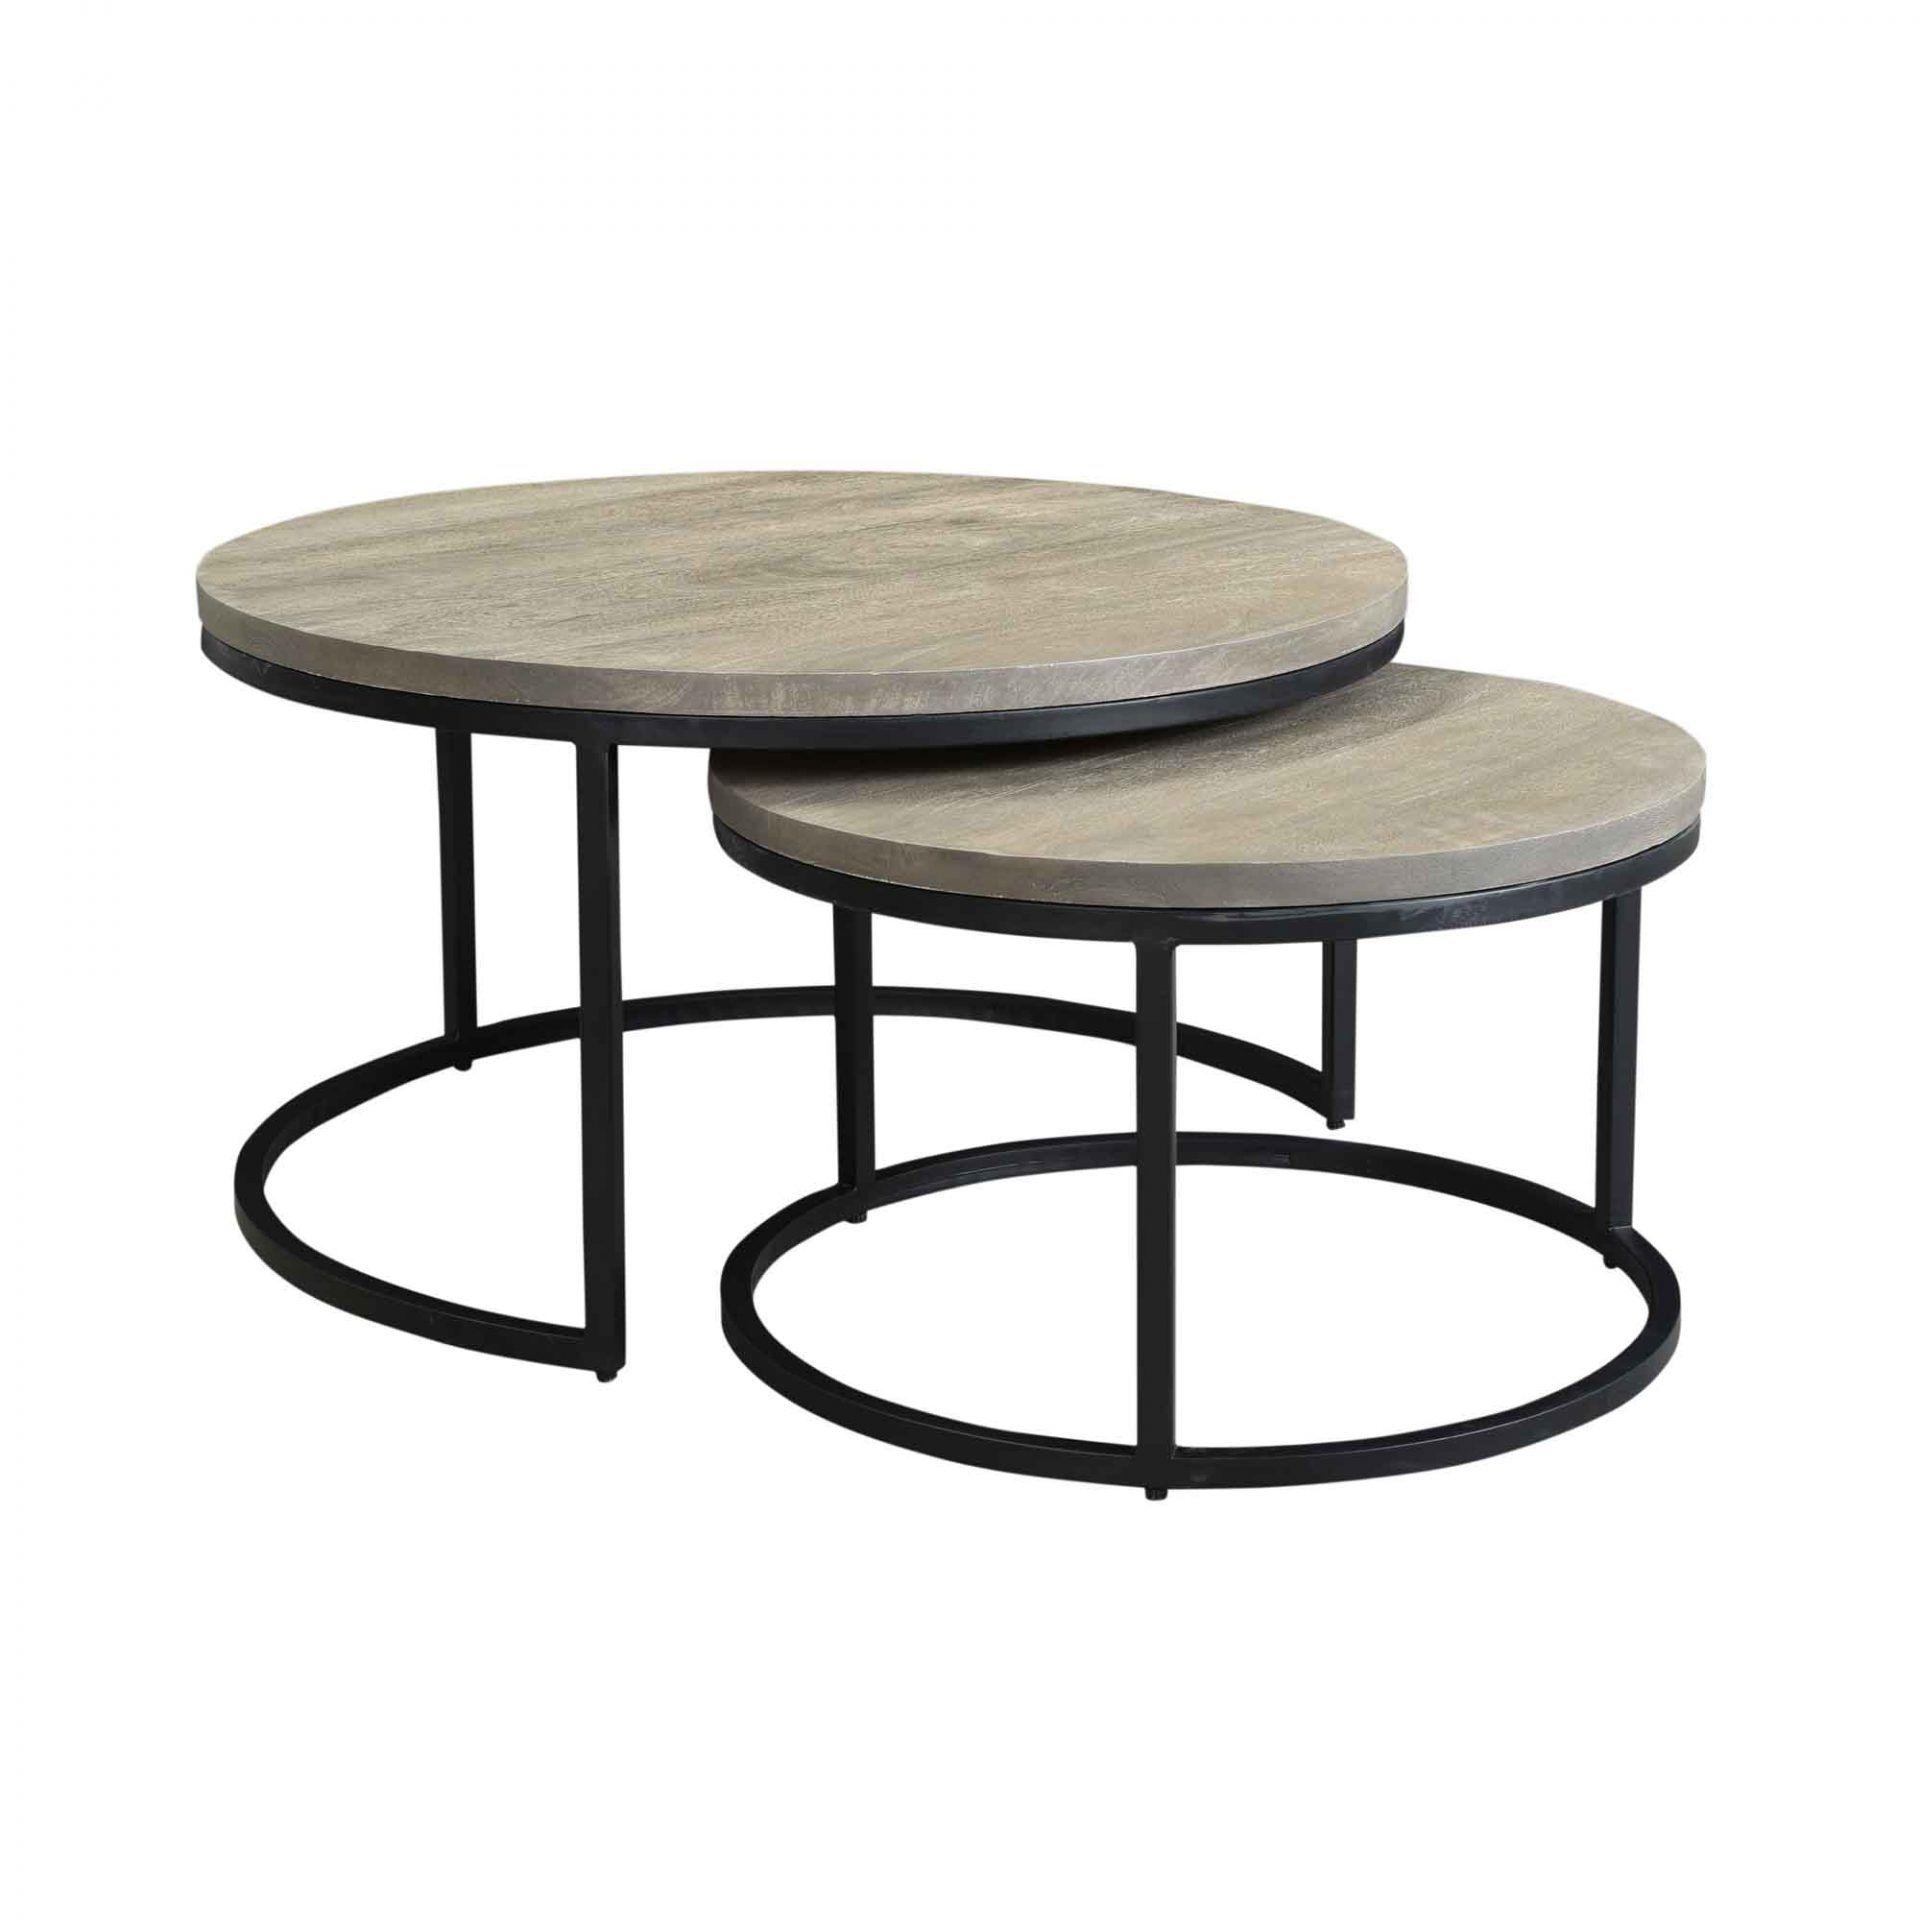 Drey Round Nesting Coffee Tables Set Of 2 Coffee Tables Moe S Wholesale Nesting Coffee Tables Round Nesting Coffee Tables Round Coffee Table Sets [ 1920 x 1920 Pixel ]